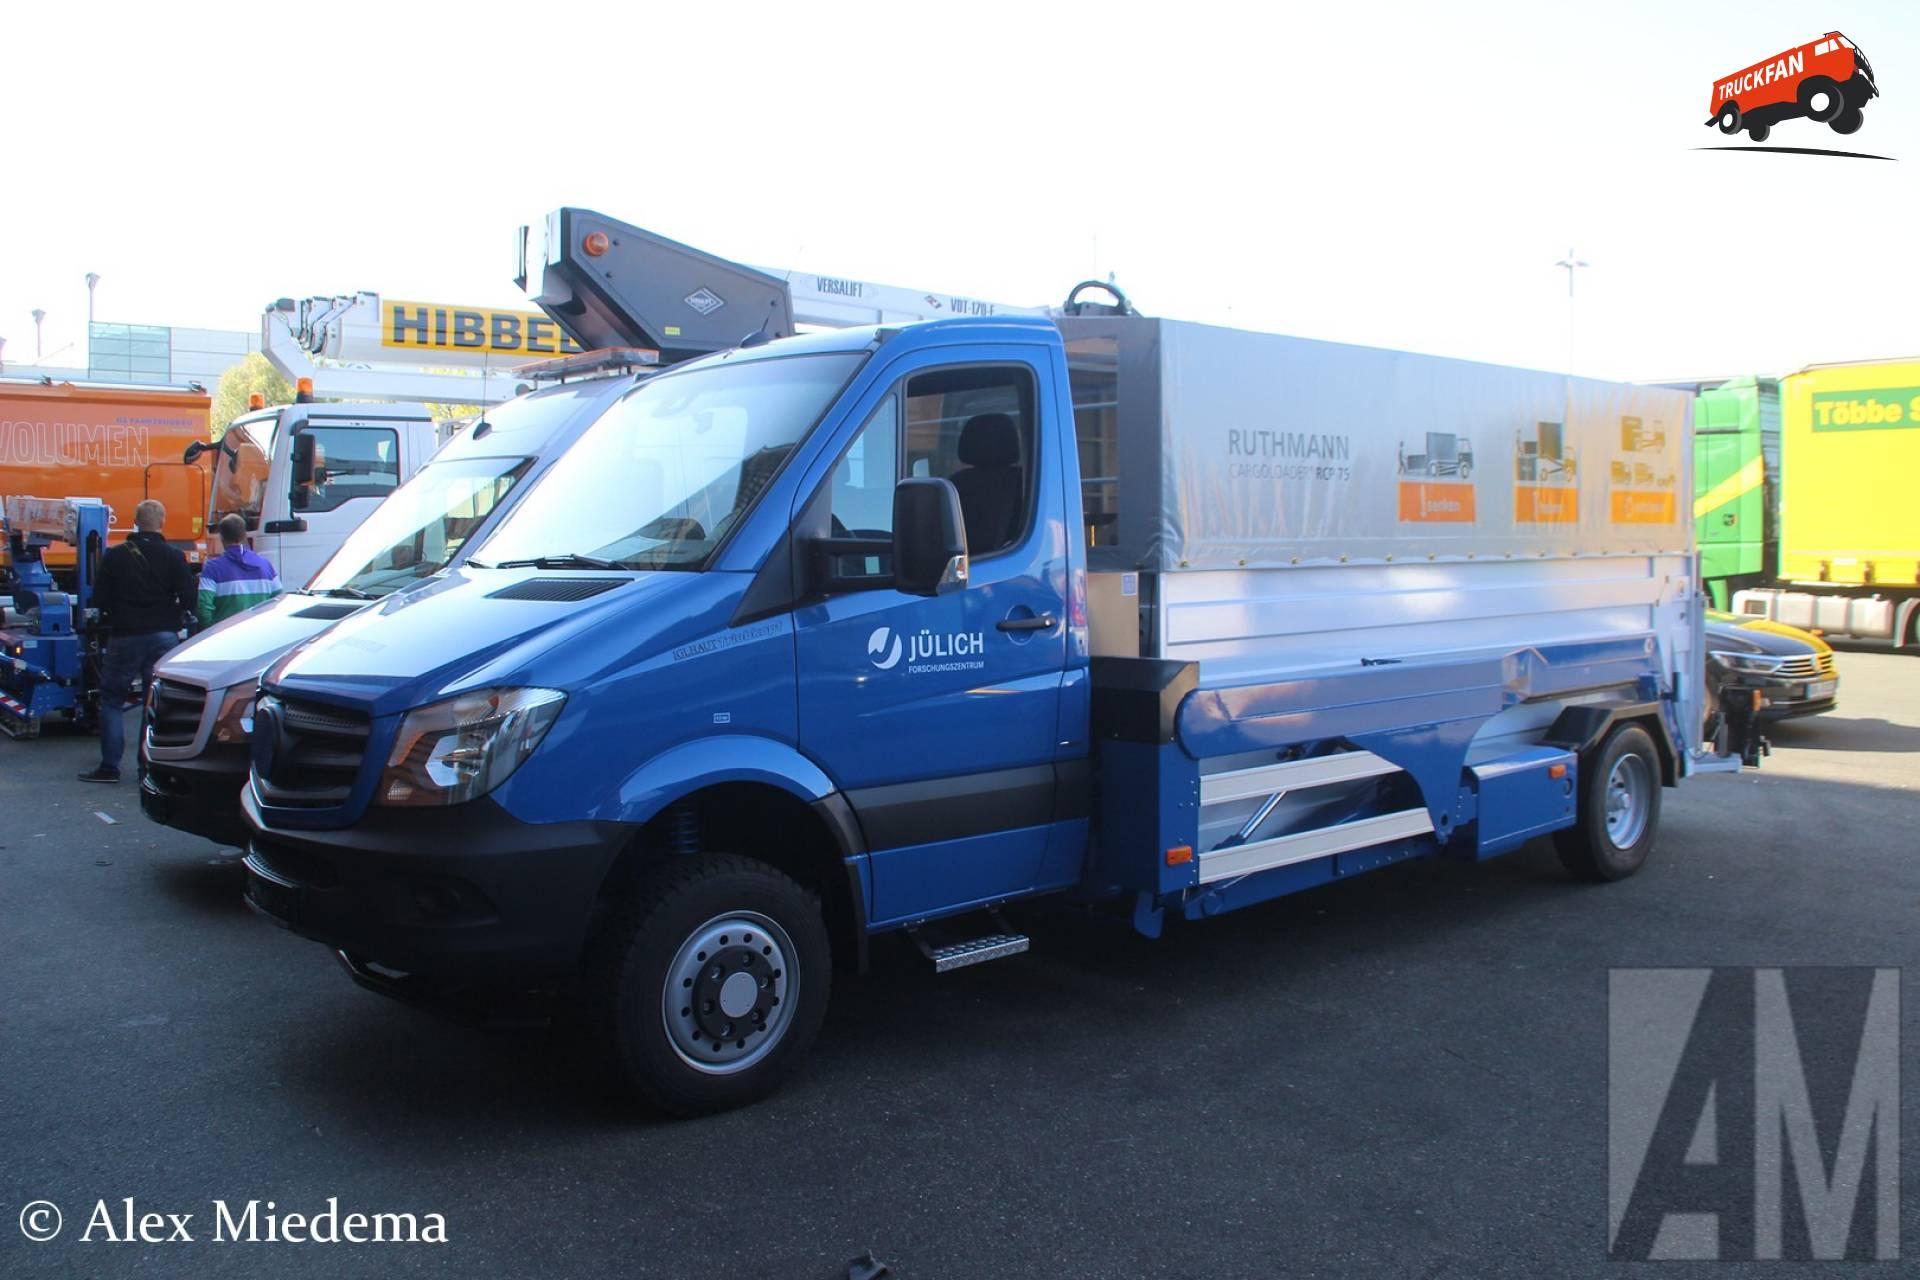 Ruthmann Cargoloader RCP75